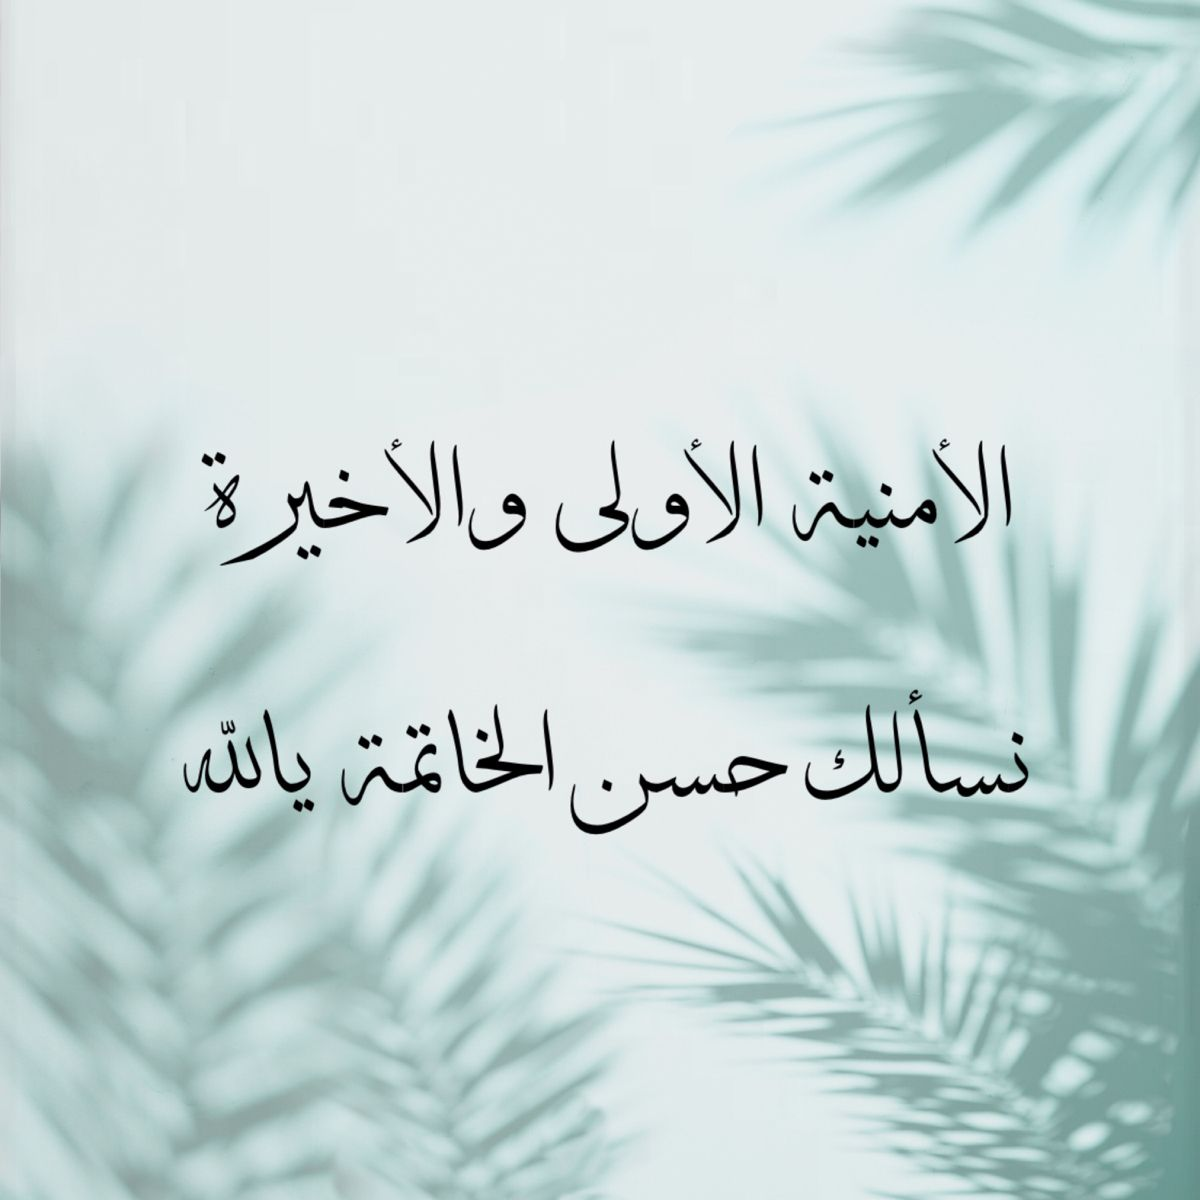 Pin By أدعية وأذكار On دعاء Islamic Quotes Quran Arabic Quotes Islamic Quotes